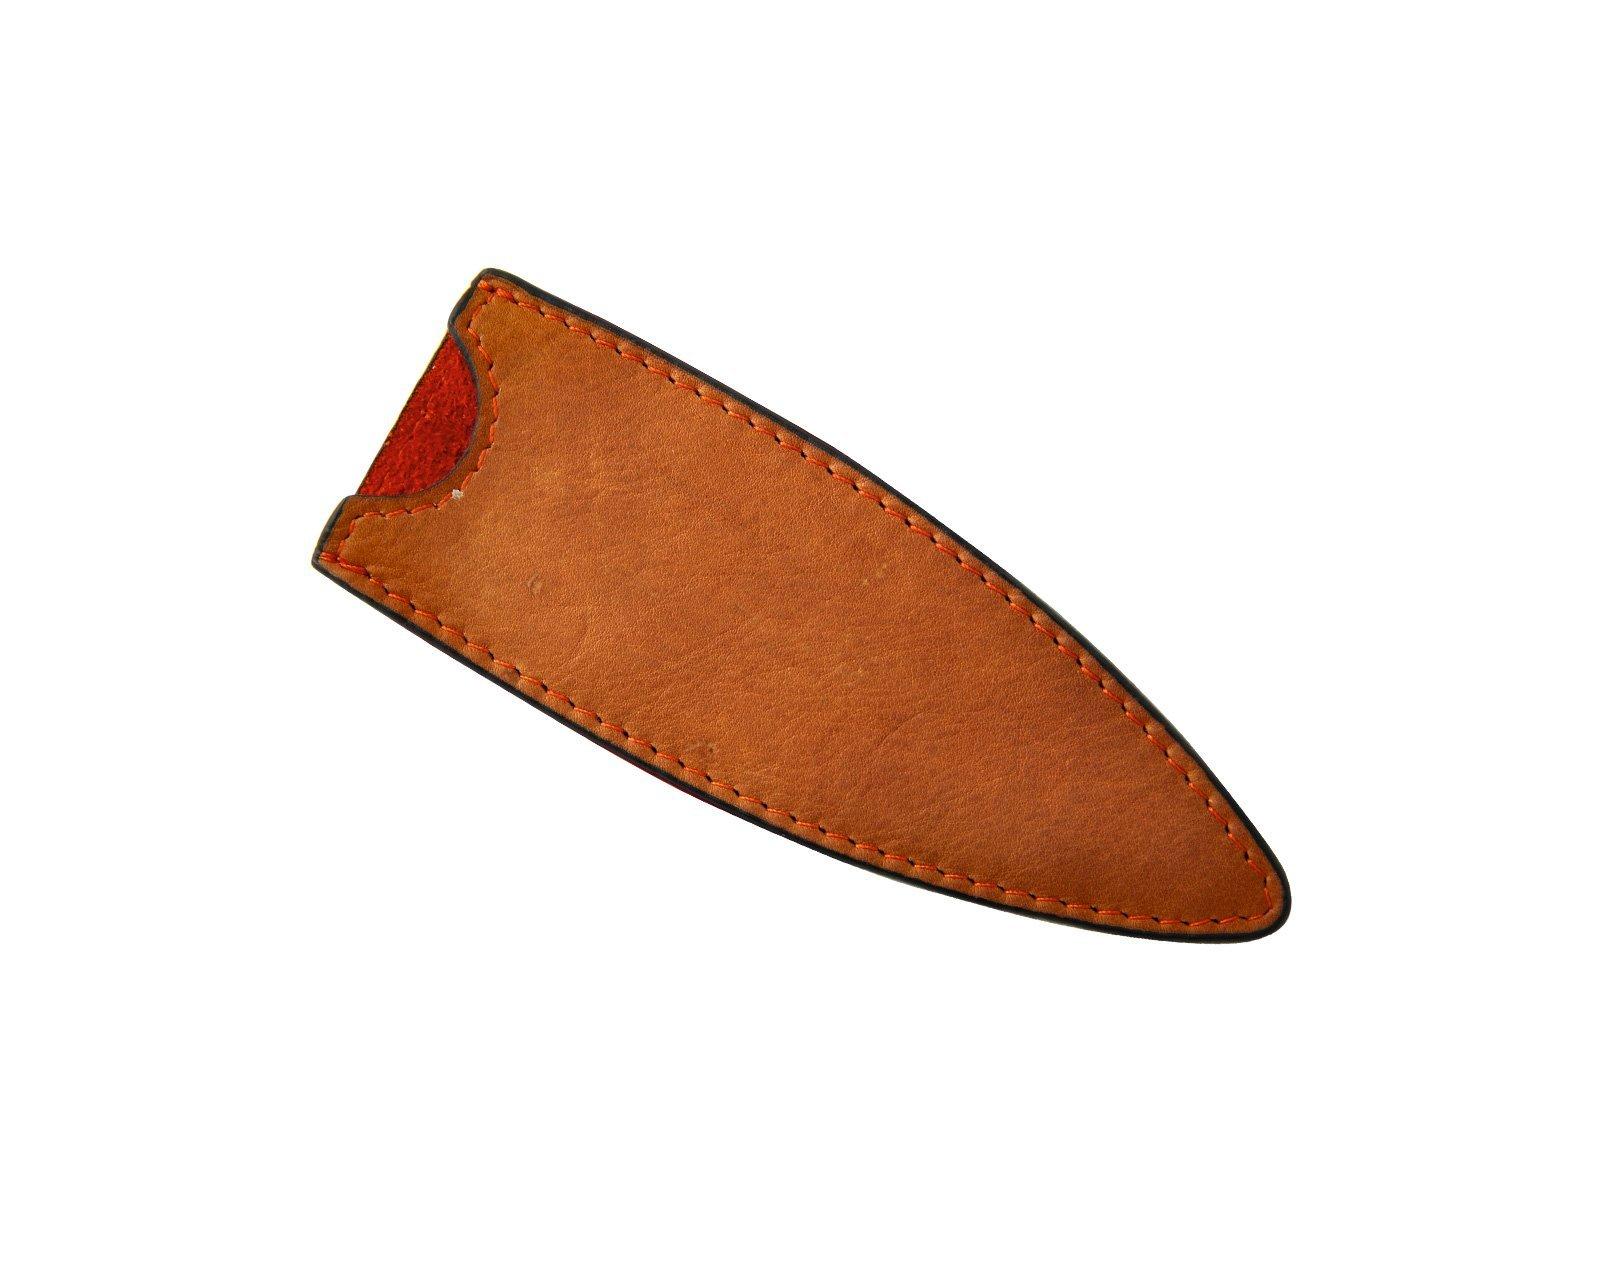 Deejo Knives 500 Leather Sheath 37g Leather Sheath 37g